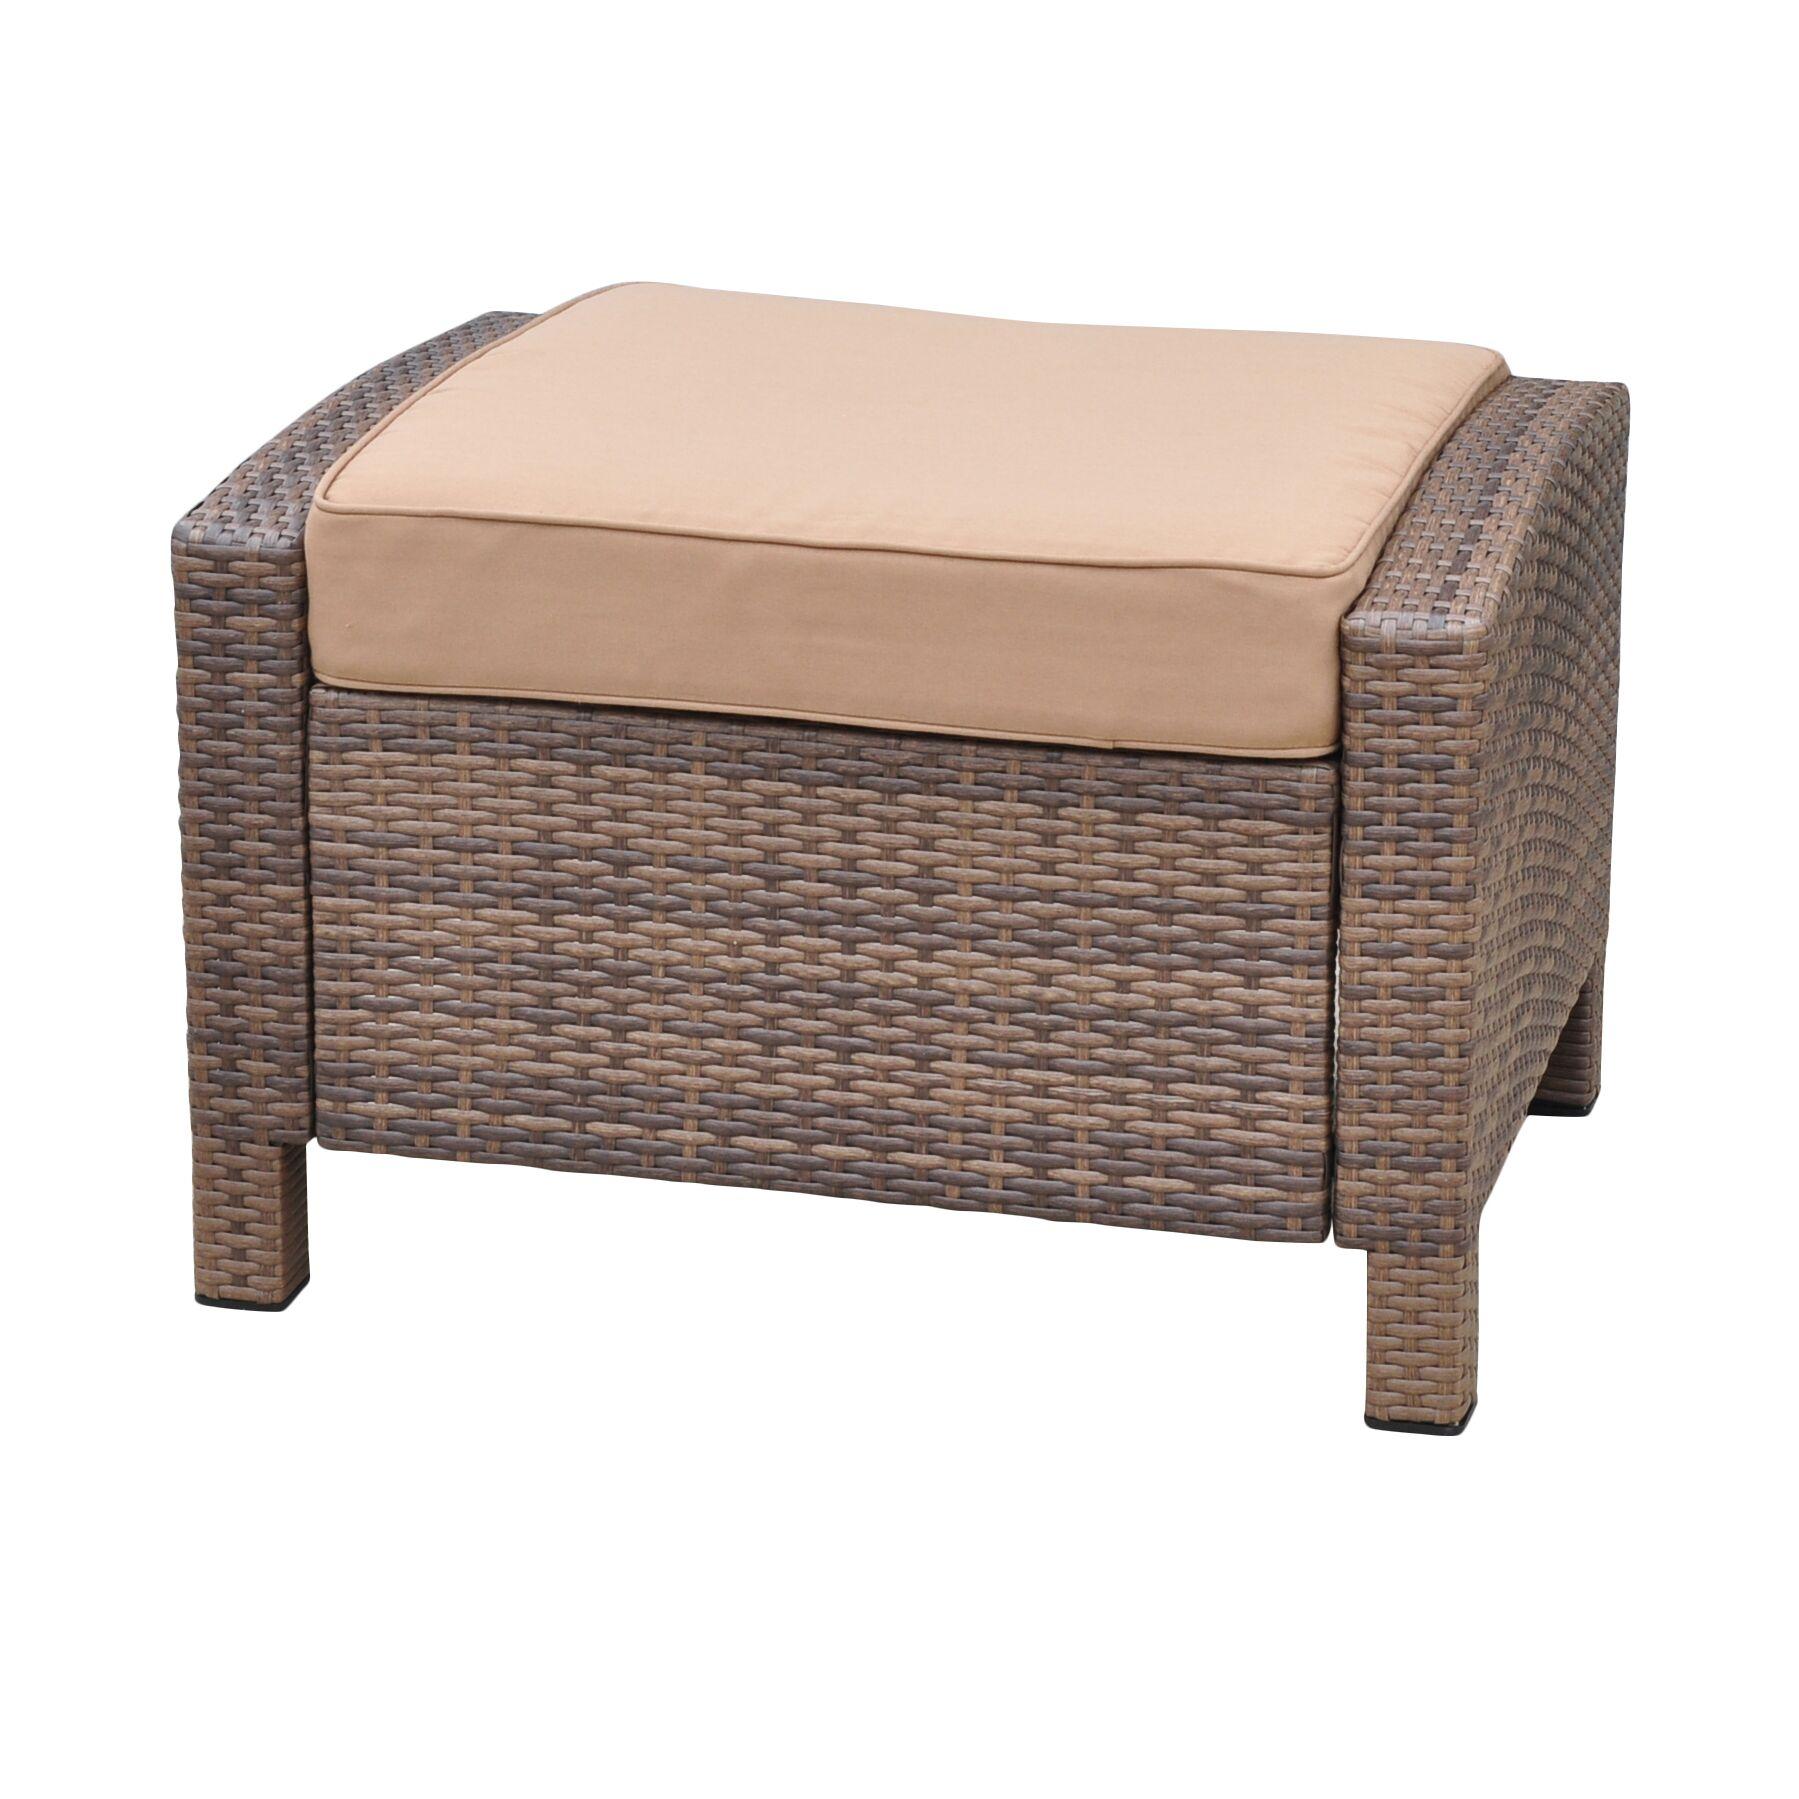 Katzer Ottoman with Cushion